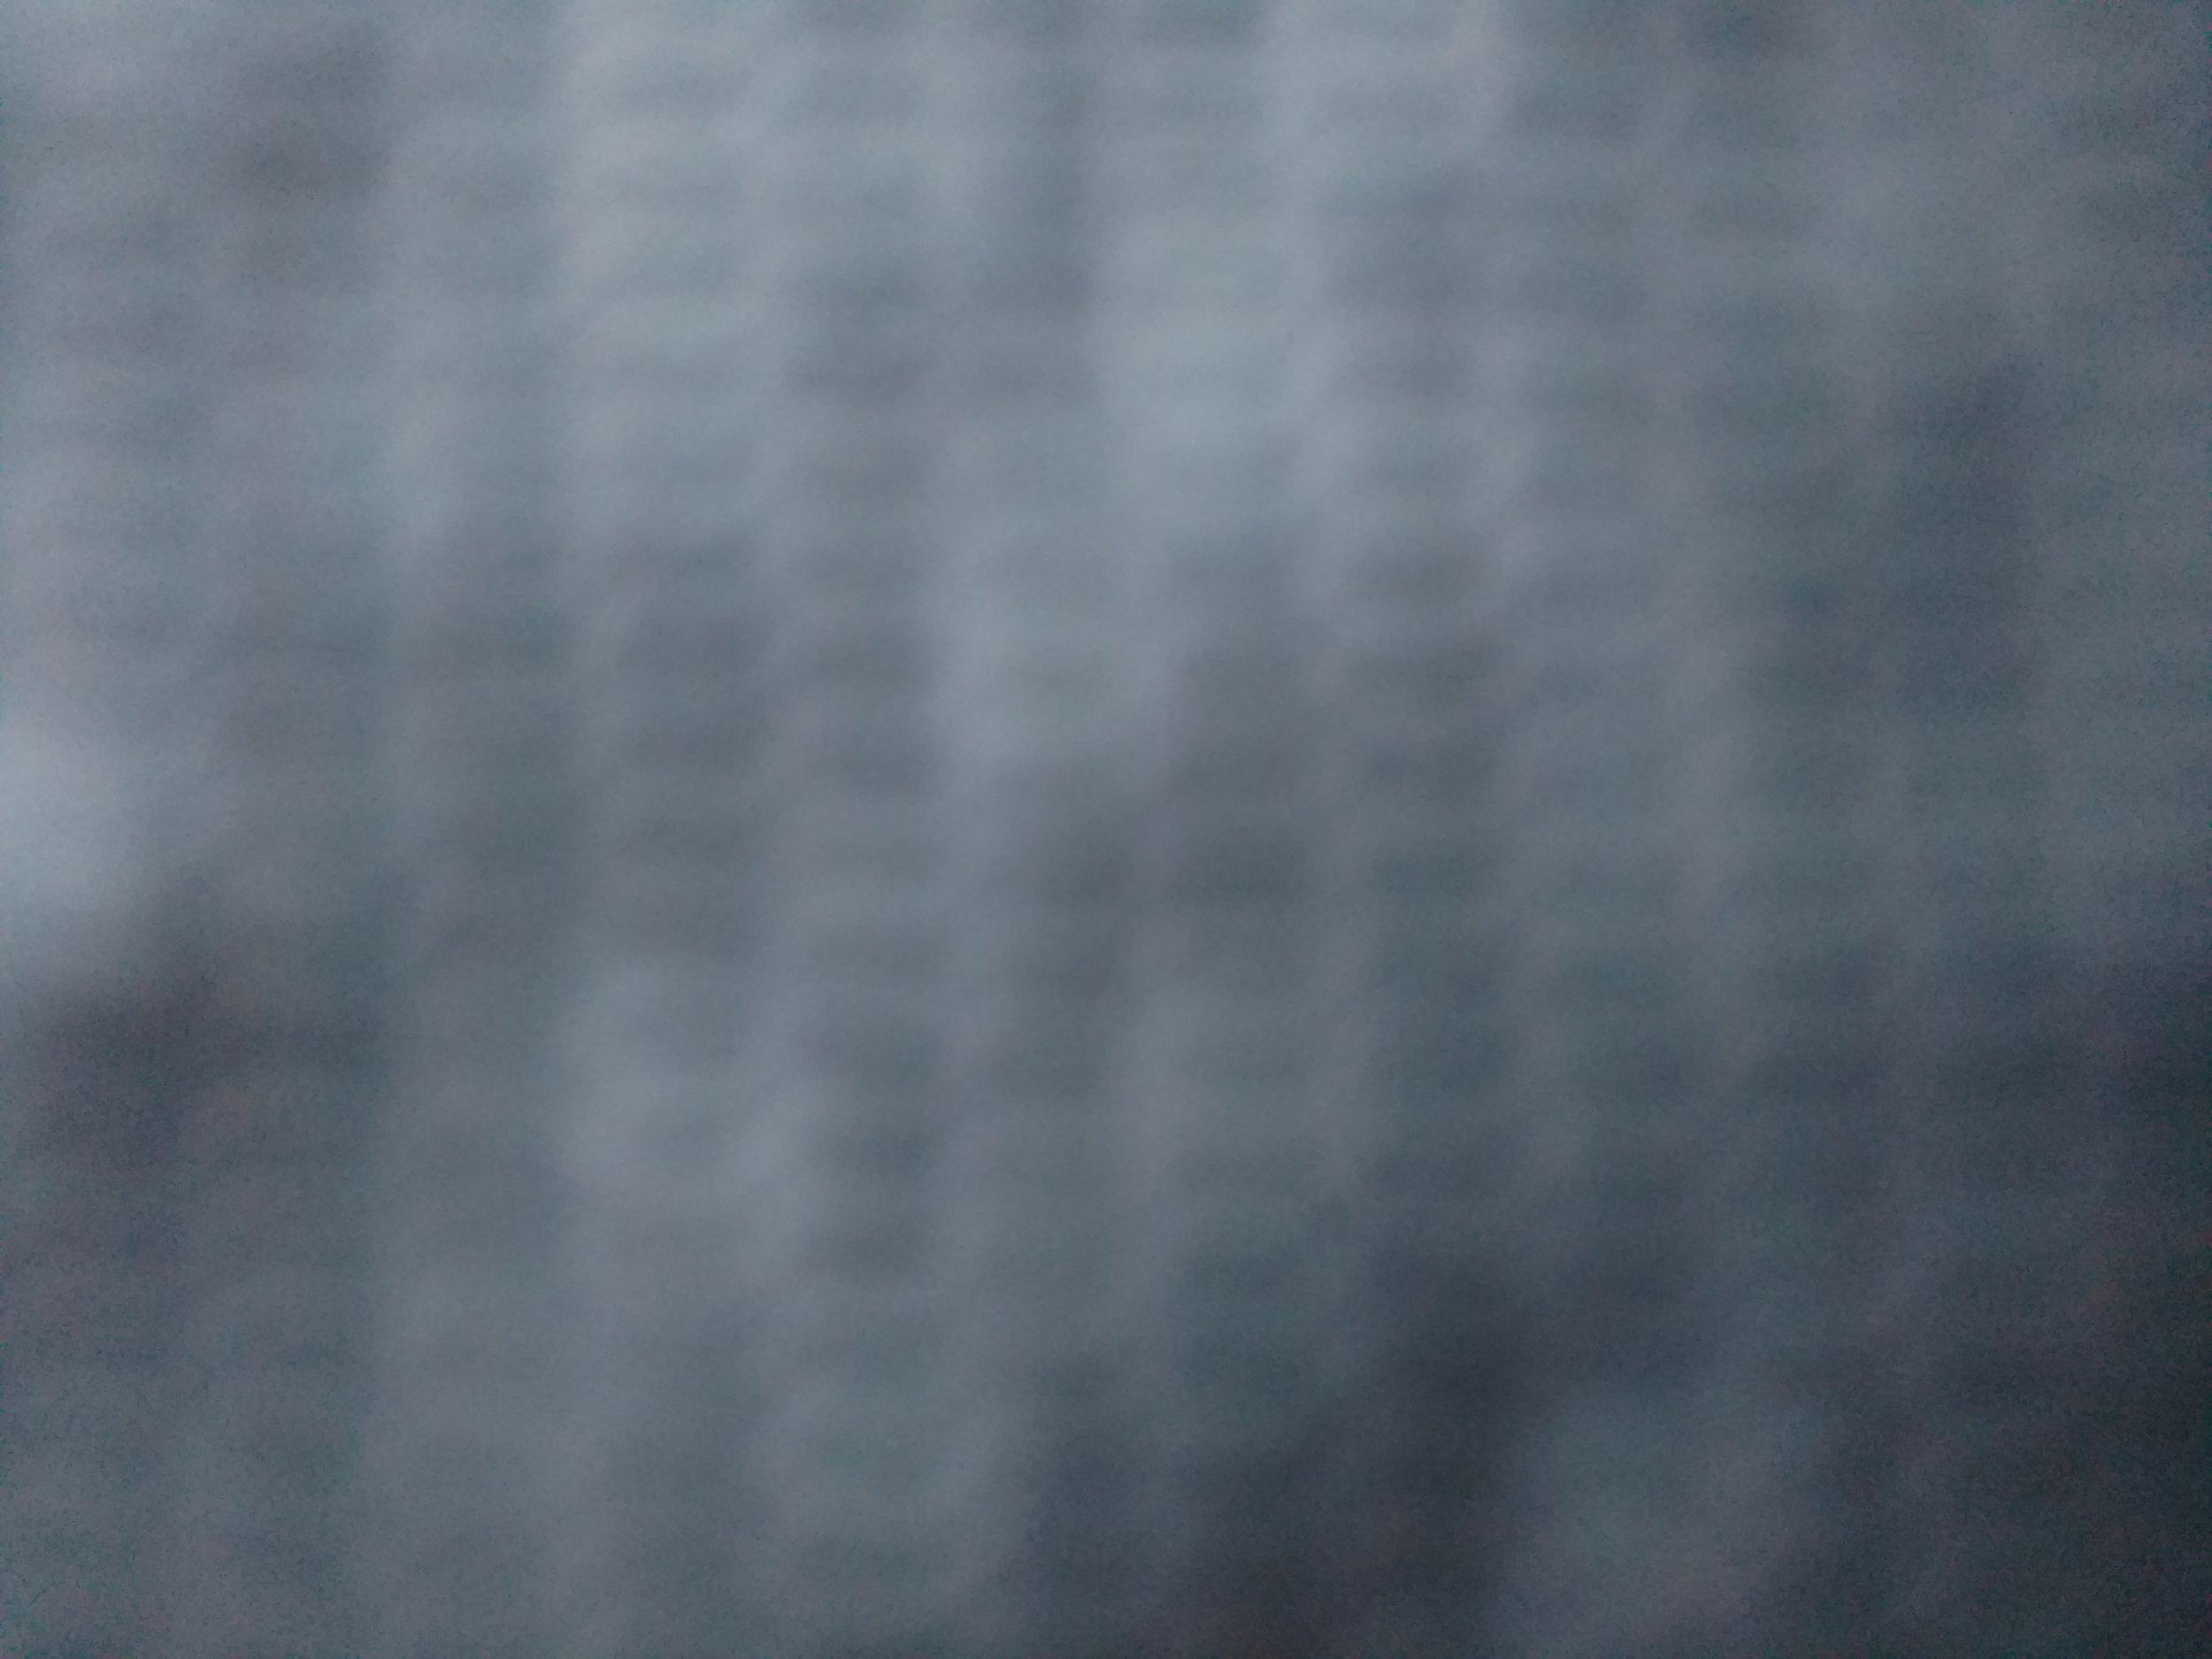 willroth-co-free-texture-gradient-055.jpg